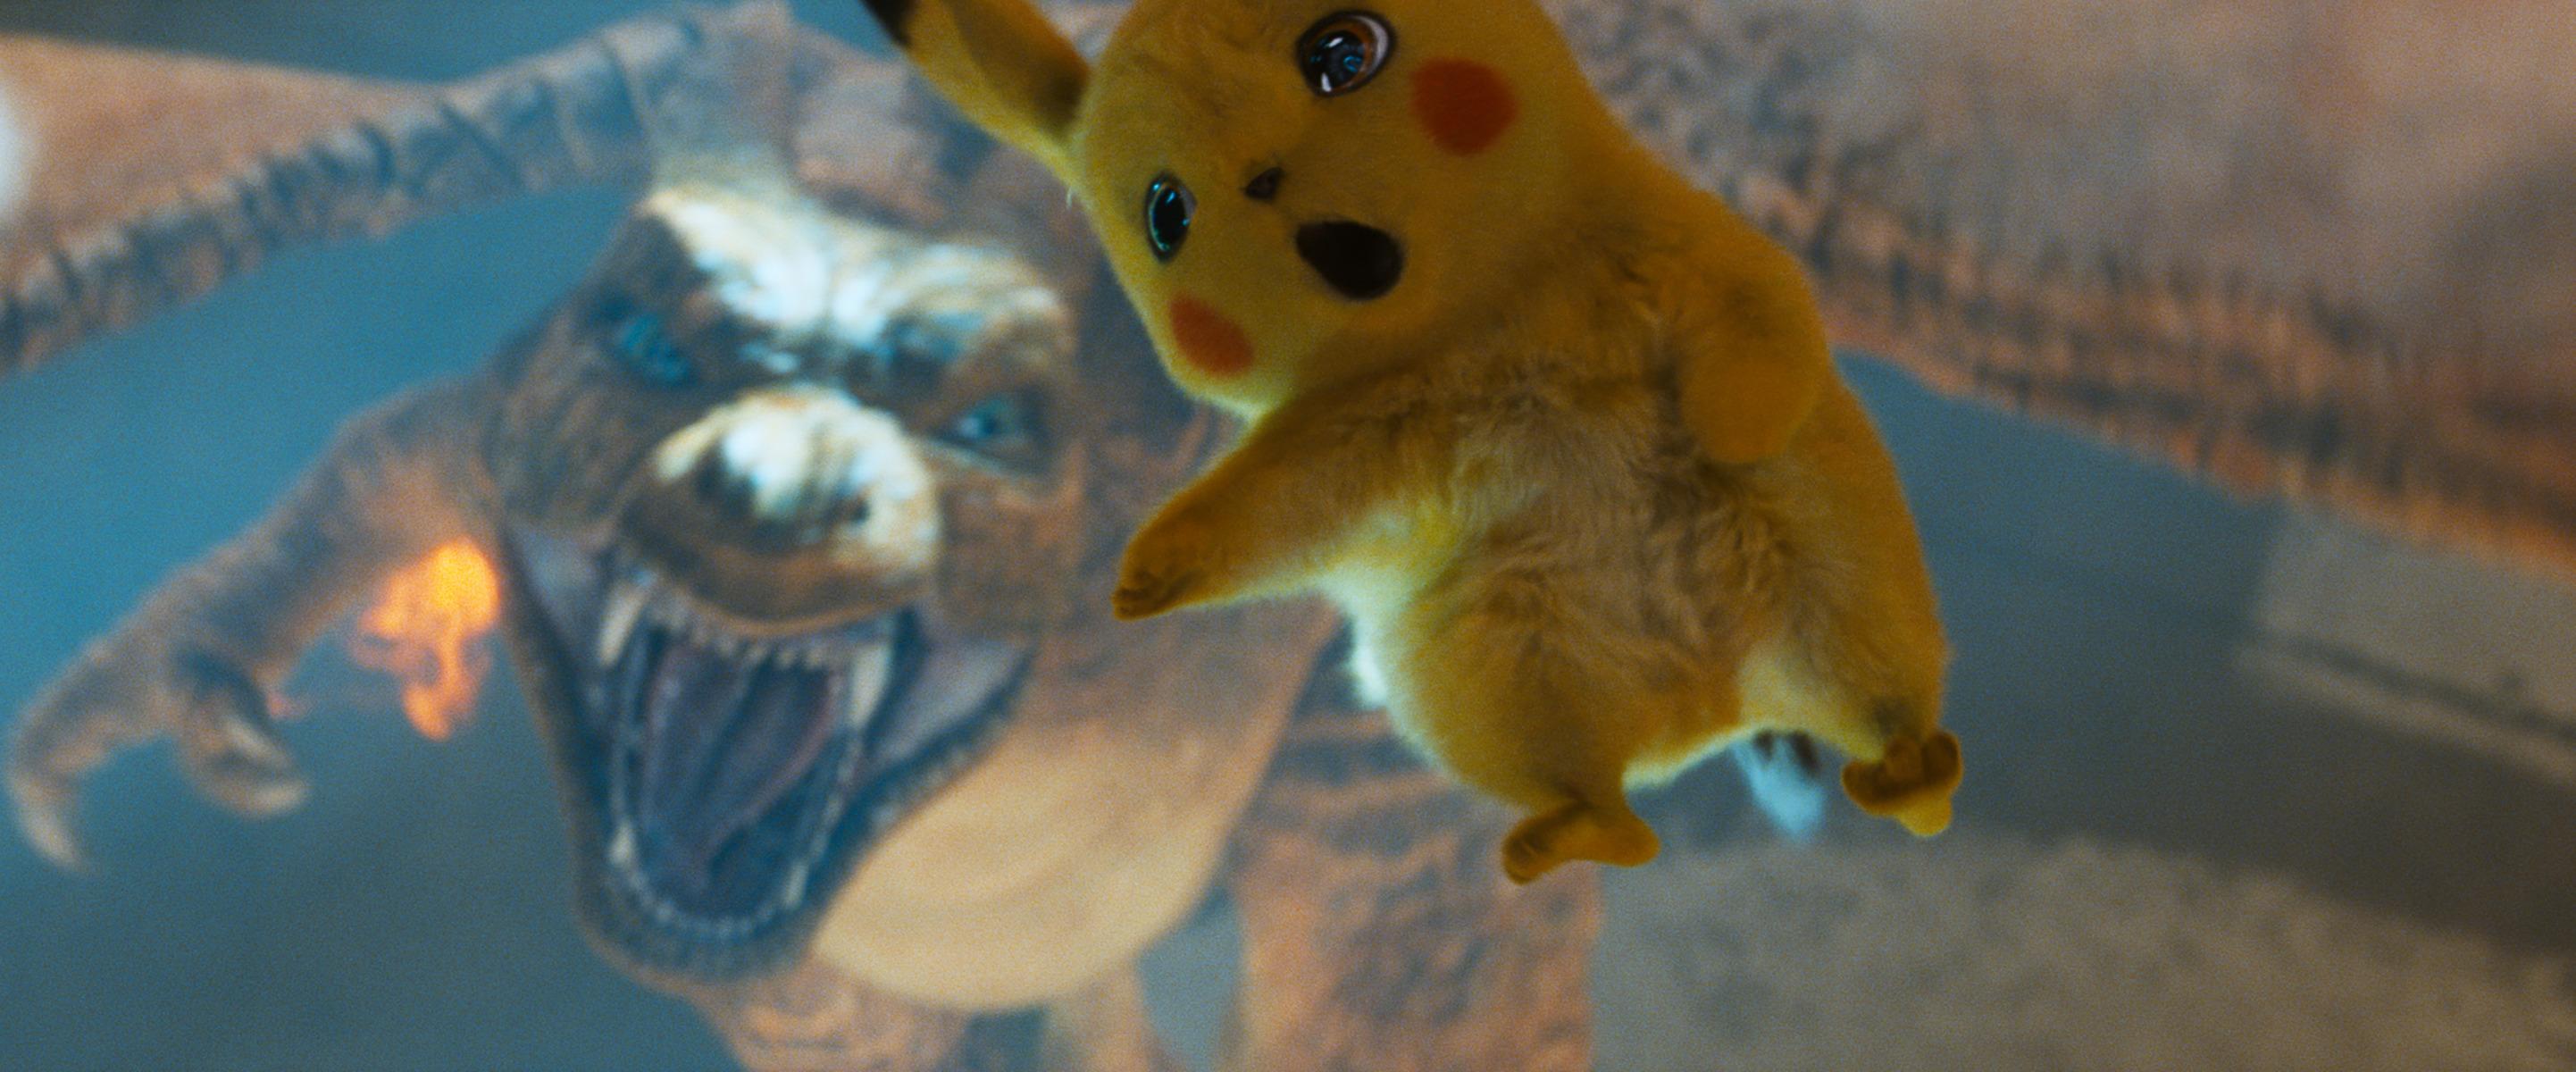 Detective Pikachu: 35 New Hi-Res Stills Of Various Pokemon, First ...